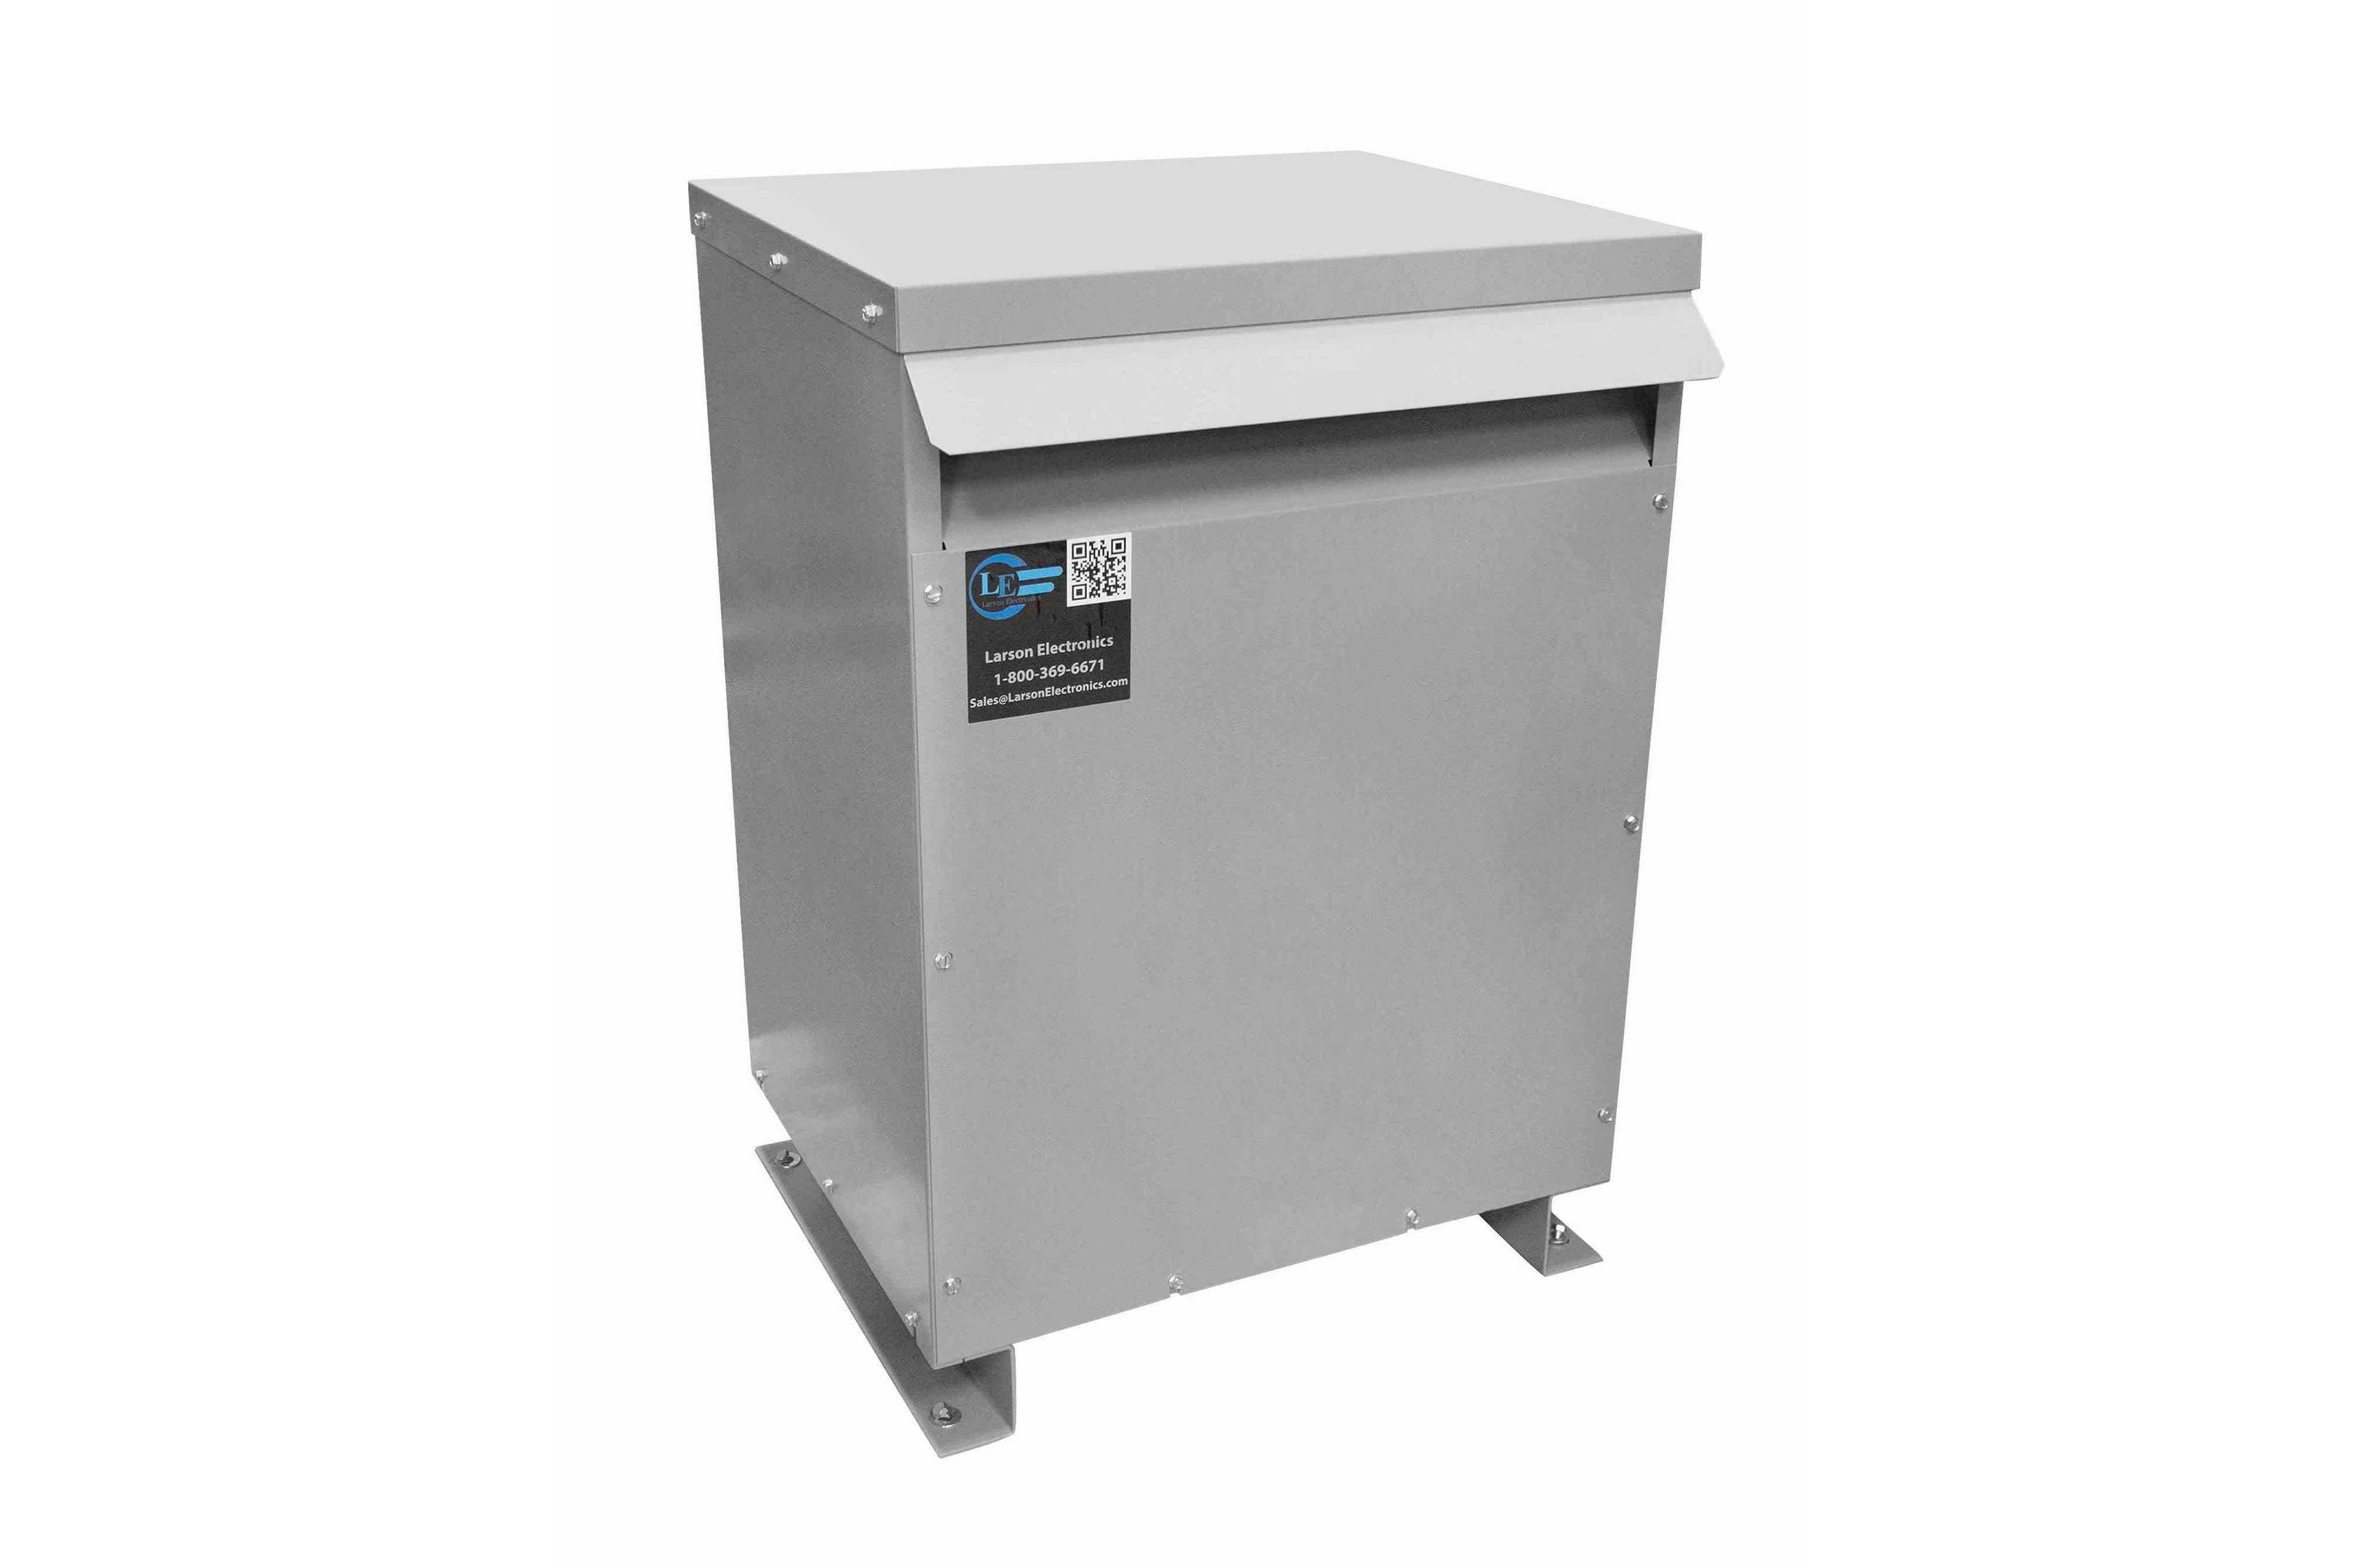 10 kVA 3PH Isolation Transformer, 460V Wye Primary, 208Y/120 Wye-N Secondary, N3R, Ventilated, 60 Hz